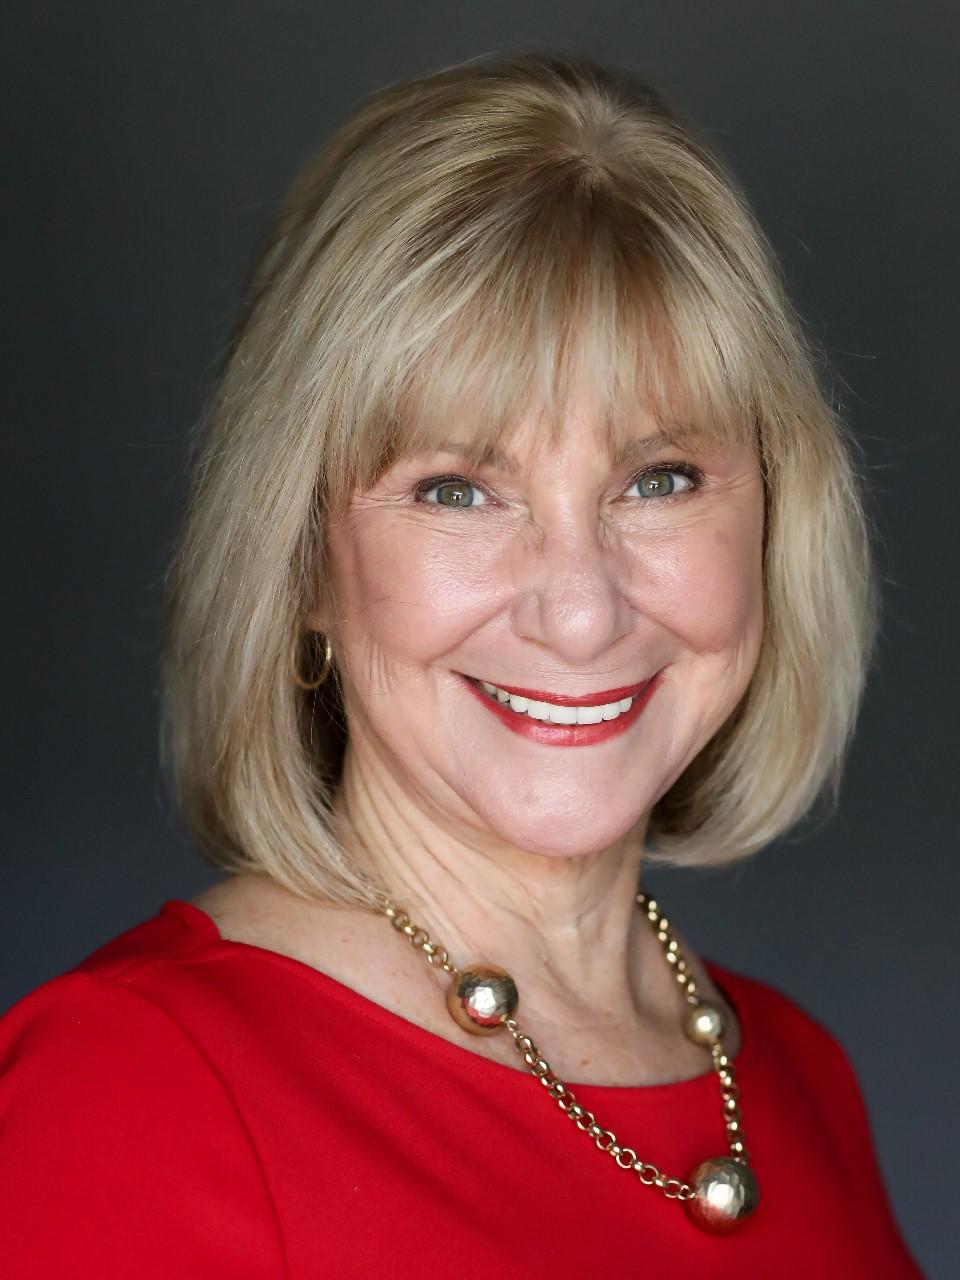 Lynne Butler Bayens